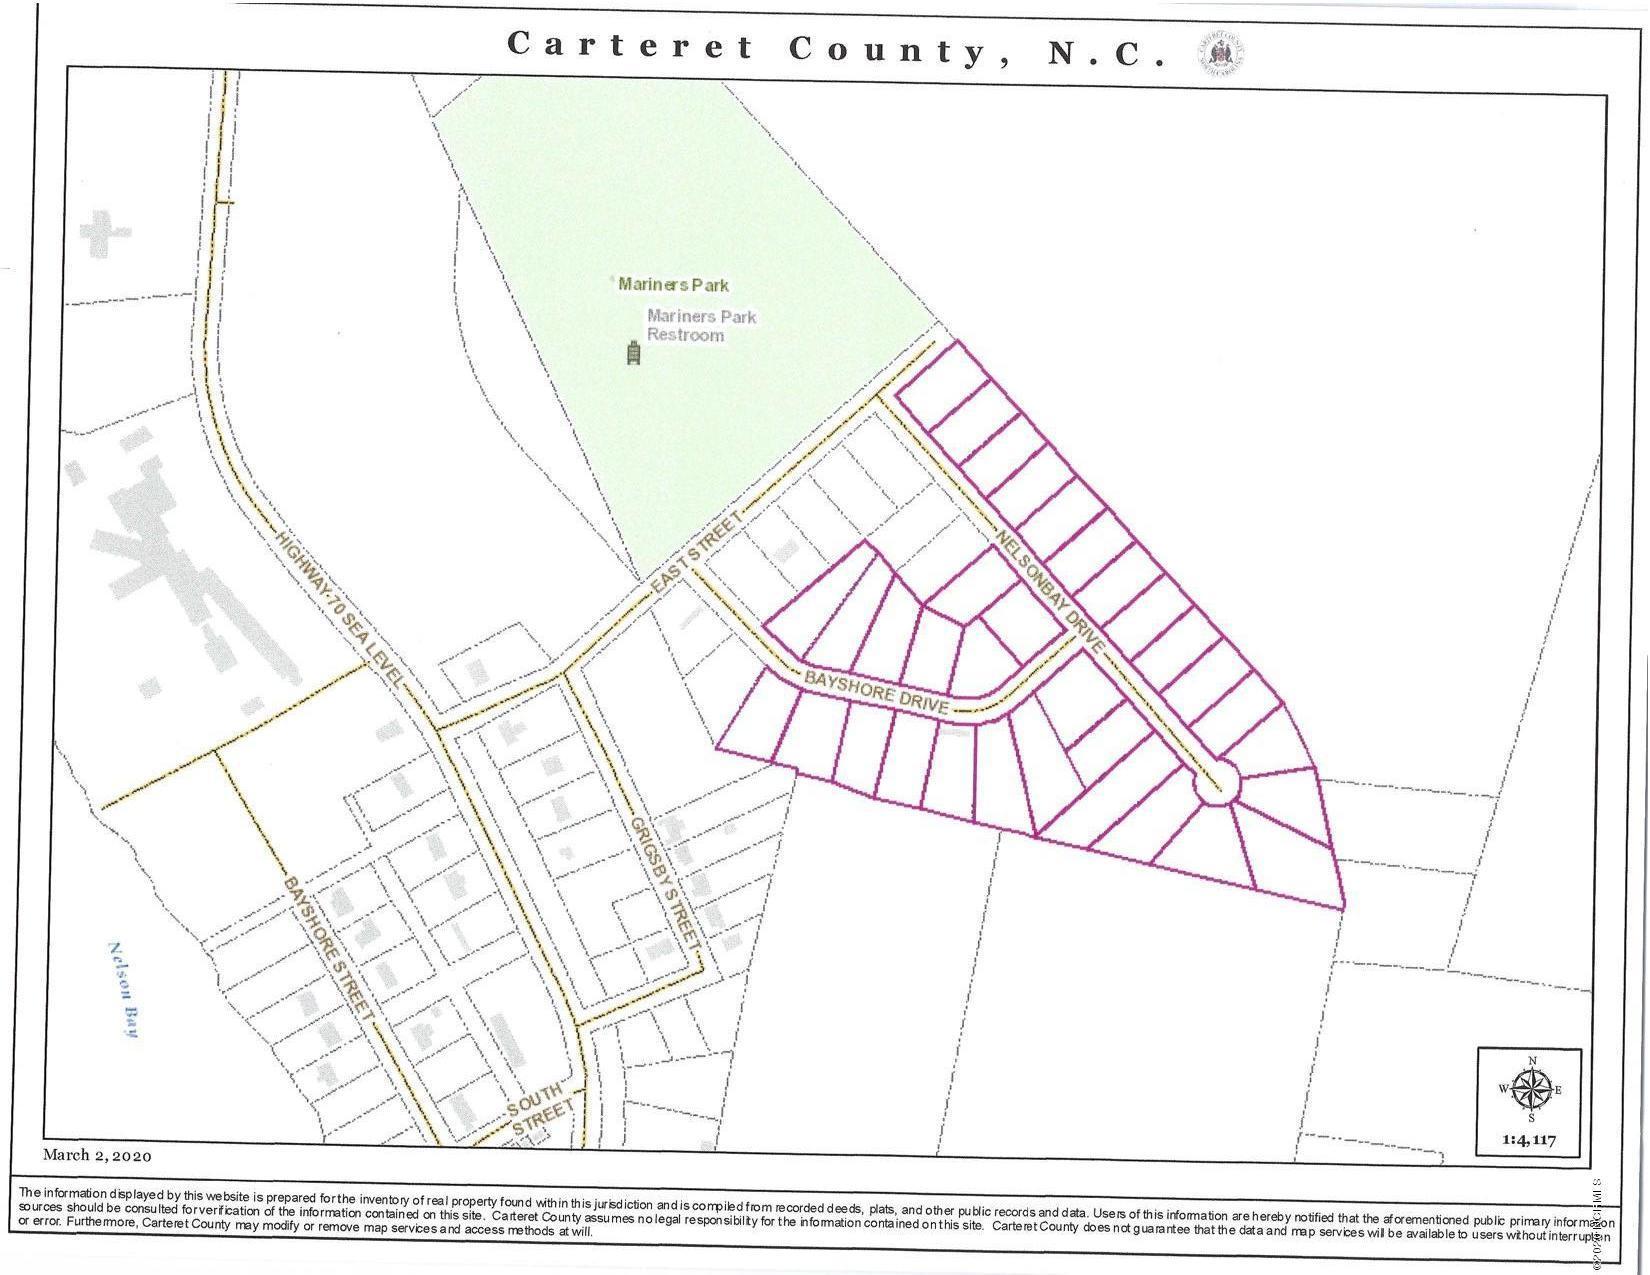 1001 Nelsonbay Drive, Sea Level, North Carolina 28577, ,For sale,Nelsonbay,100207034